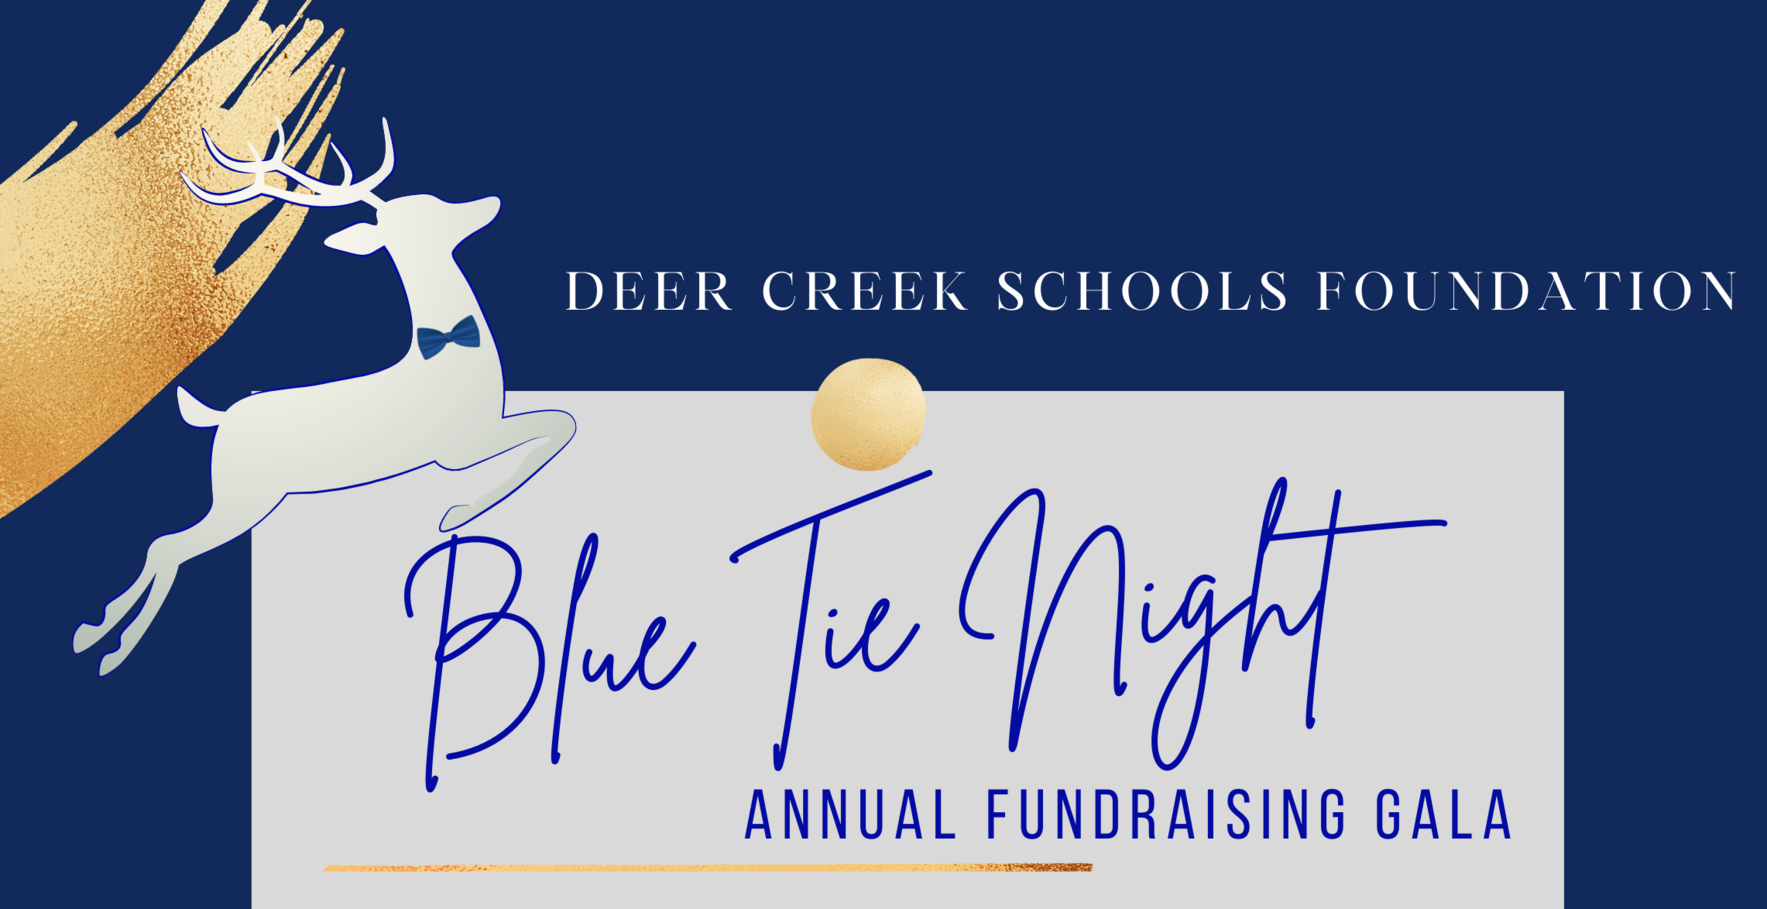 Blue Tie Night - Deer Creek Schools Foundation Annual Fundraising Event image